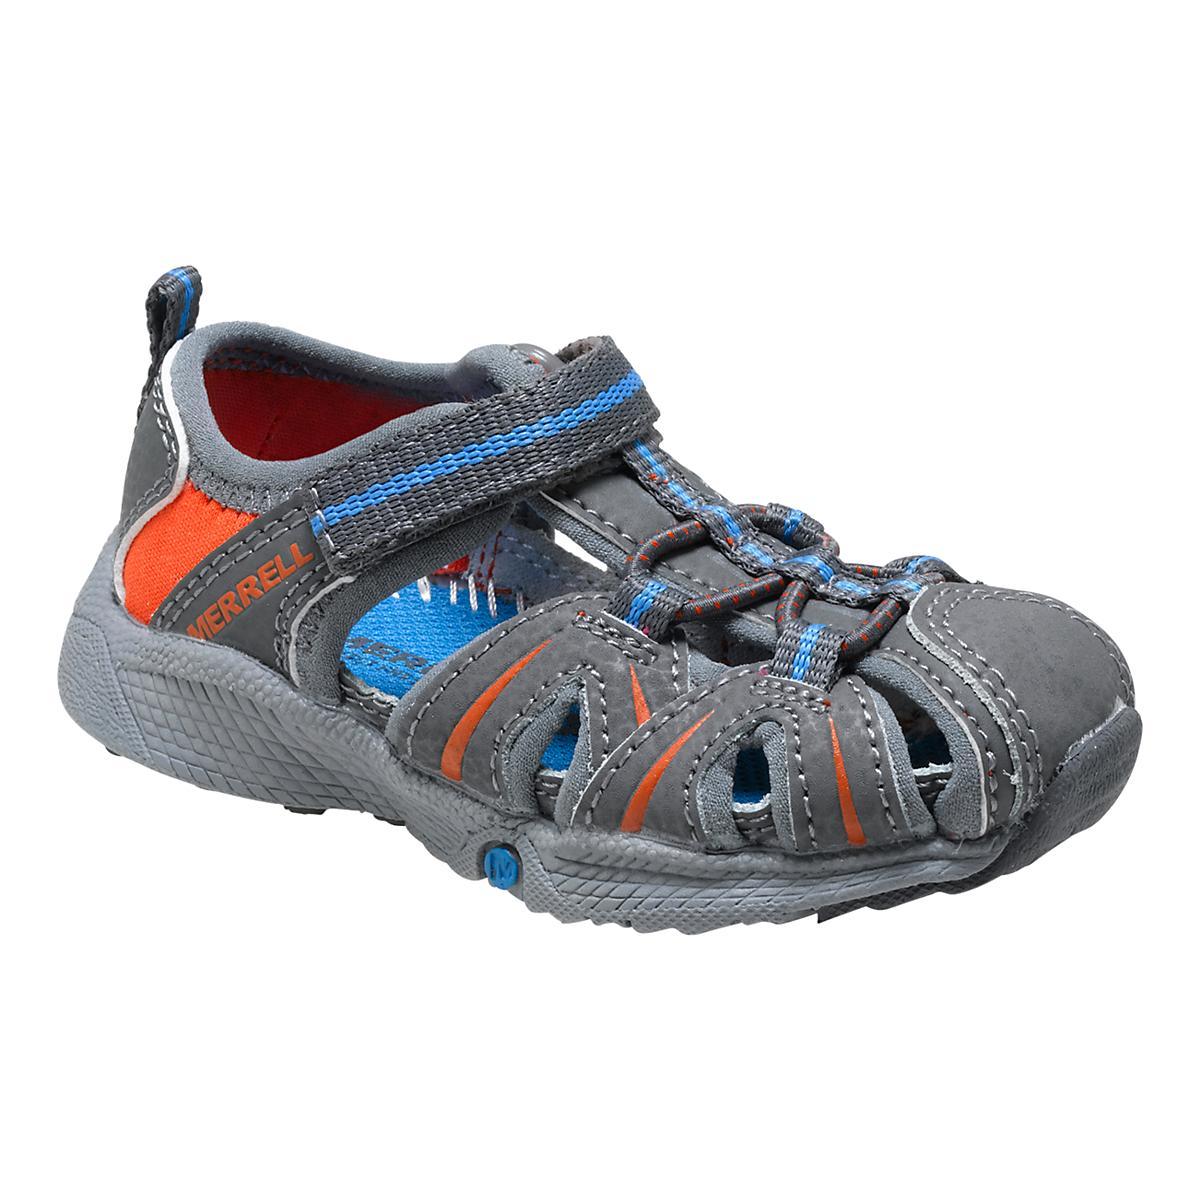 fd21e6712cfa Kids Merrell Hydro Hiker Sandals Shoe